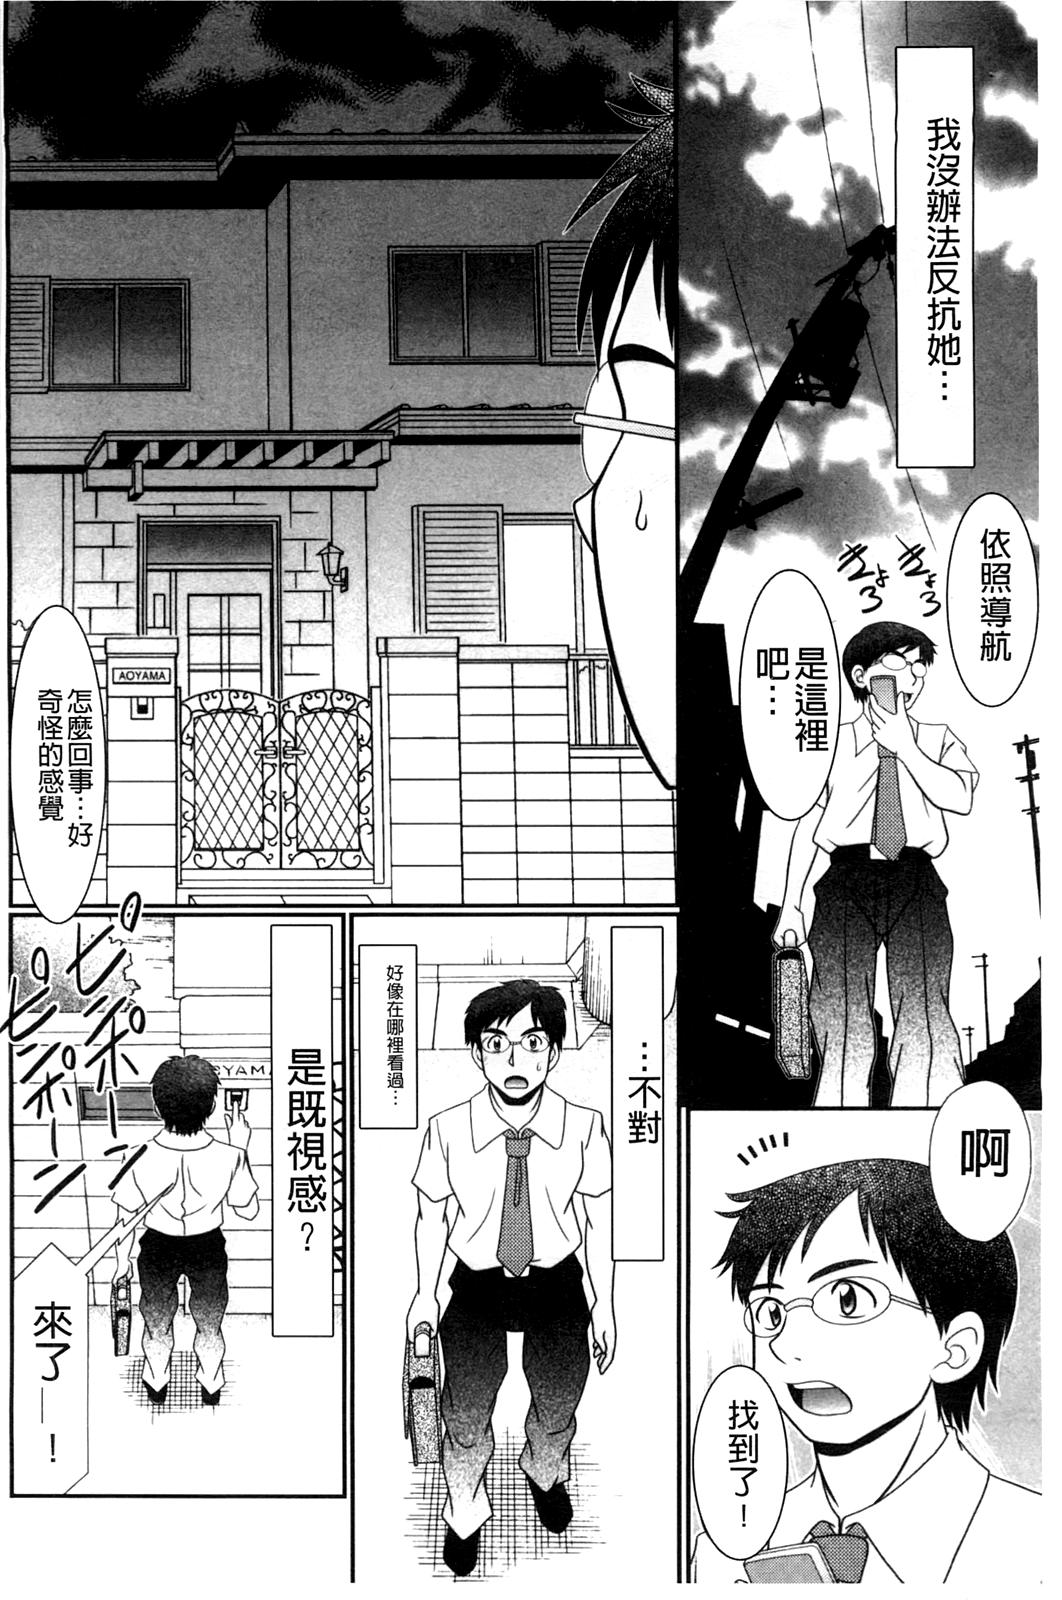 Higyaku Kyoushitsu 138